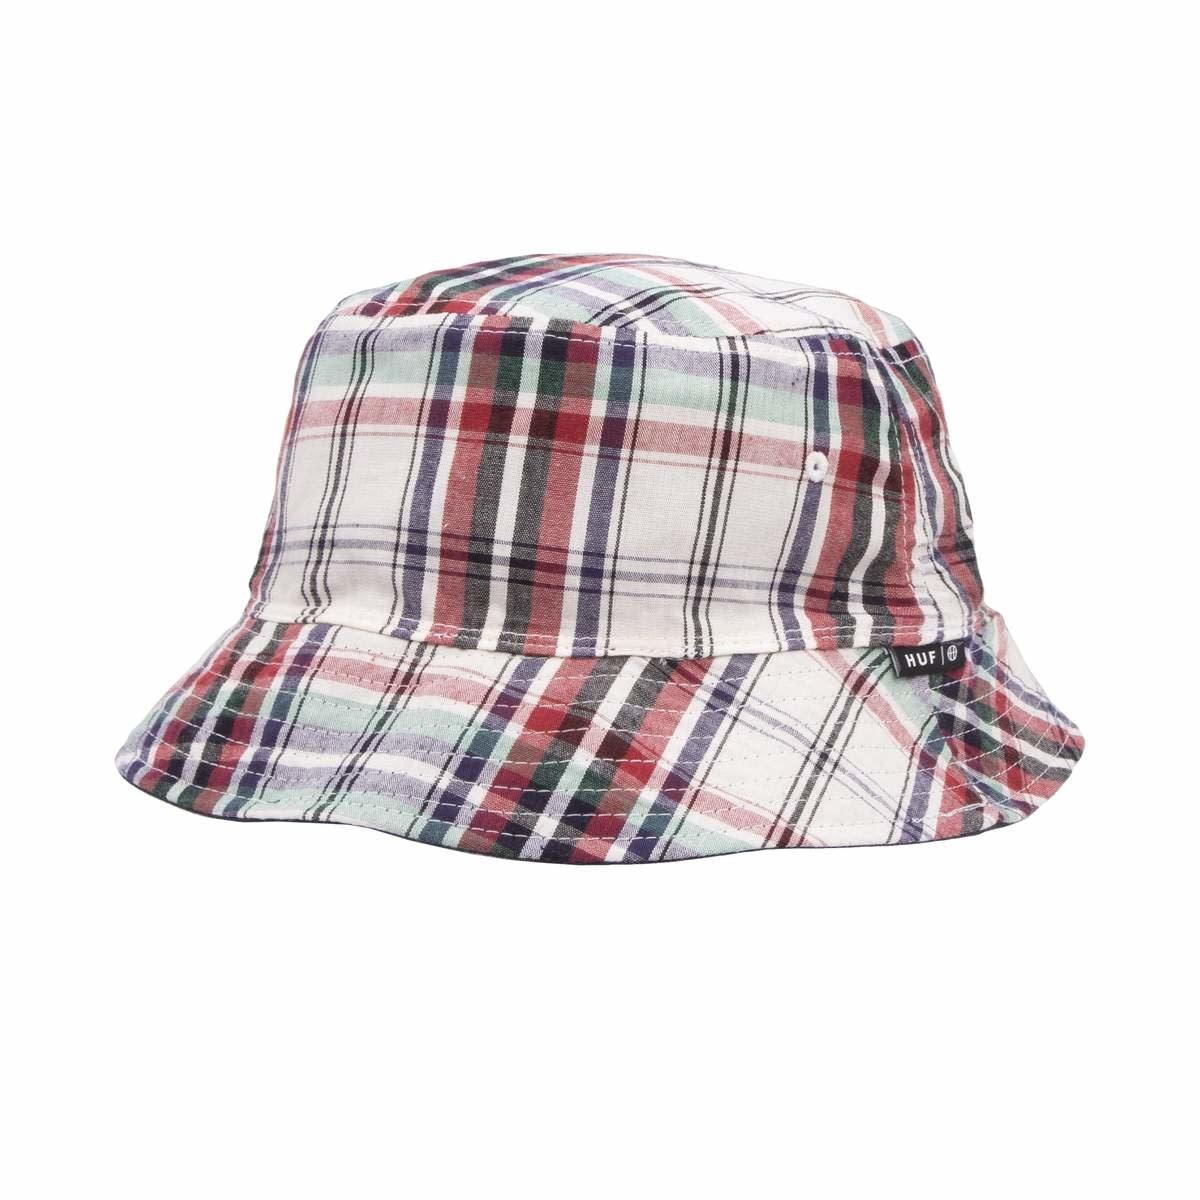 HUF Crown Reversible Bucket Hat Navy Blazer L/XL